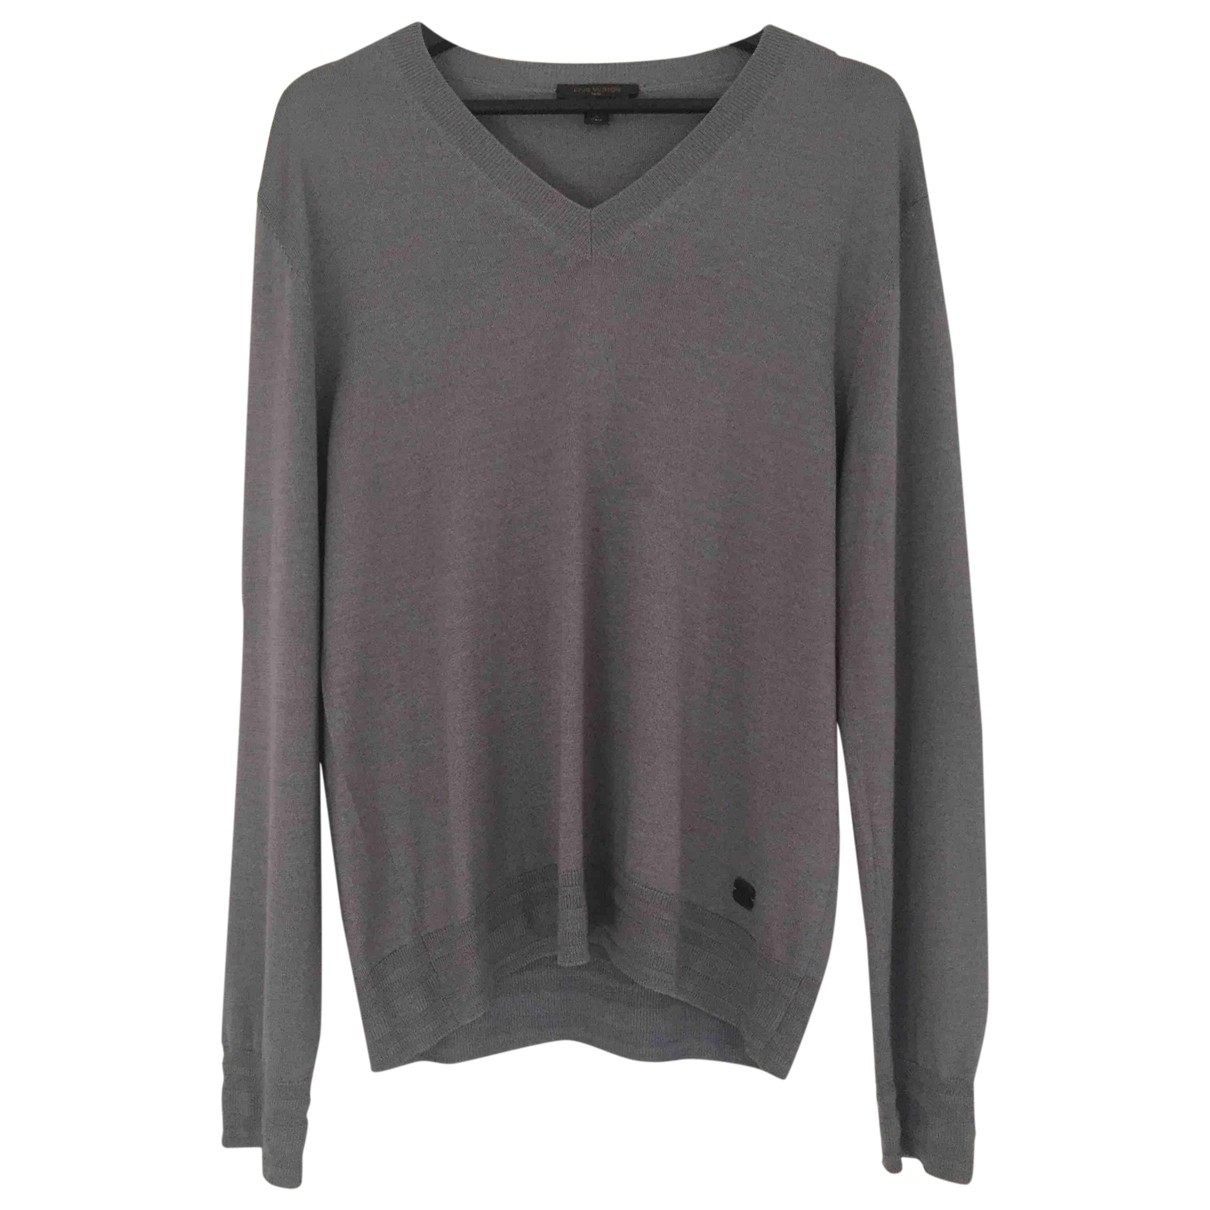 Louis Vuitton \N Cashmere Knitwear & Sweatshirts for Men S International